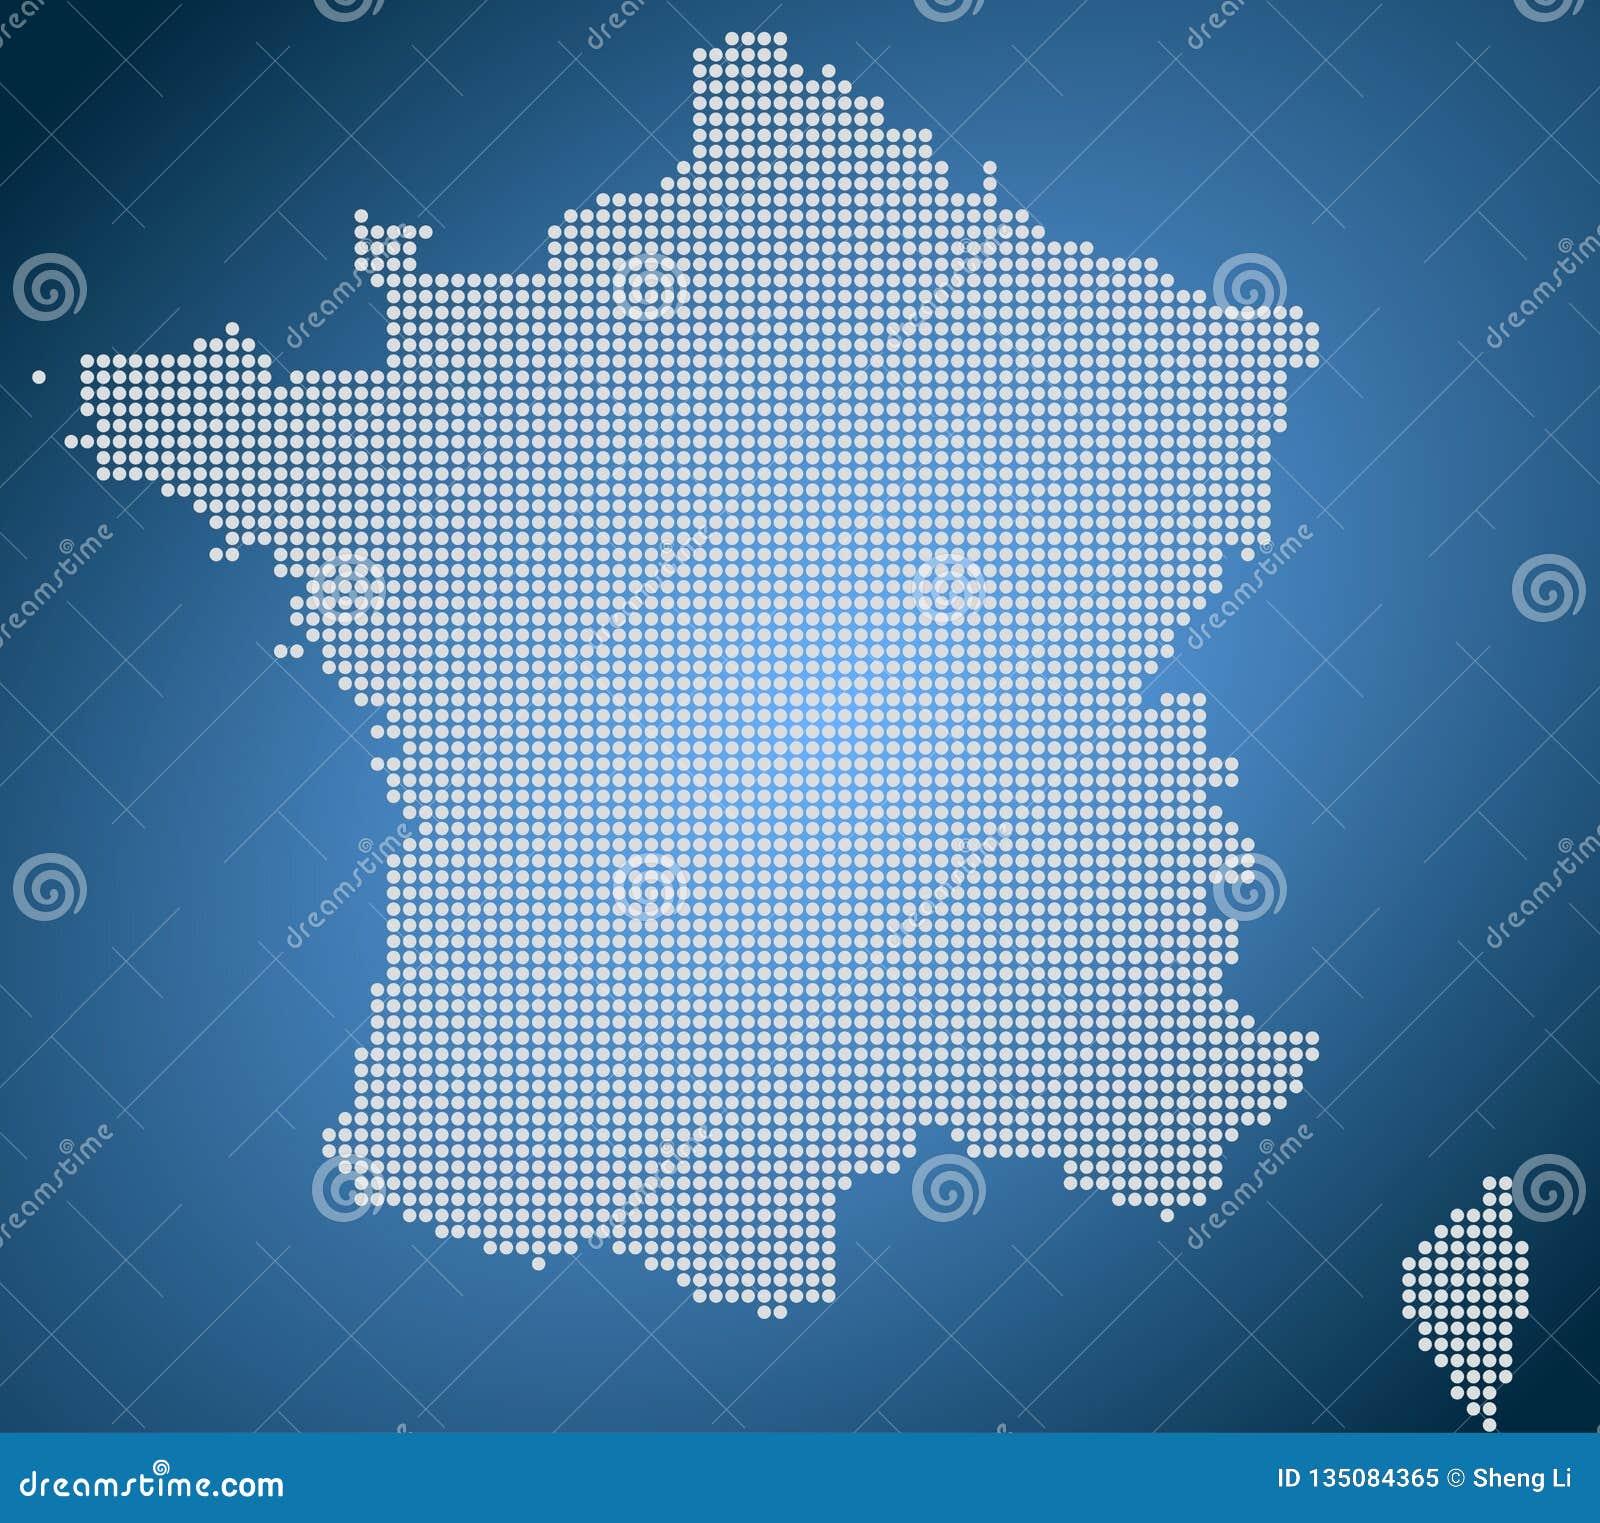 En översikt av Frankrike, PIXEL